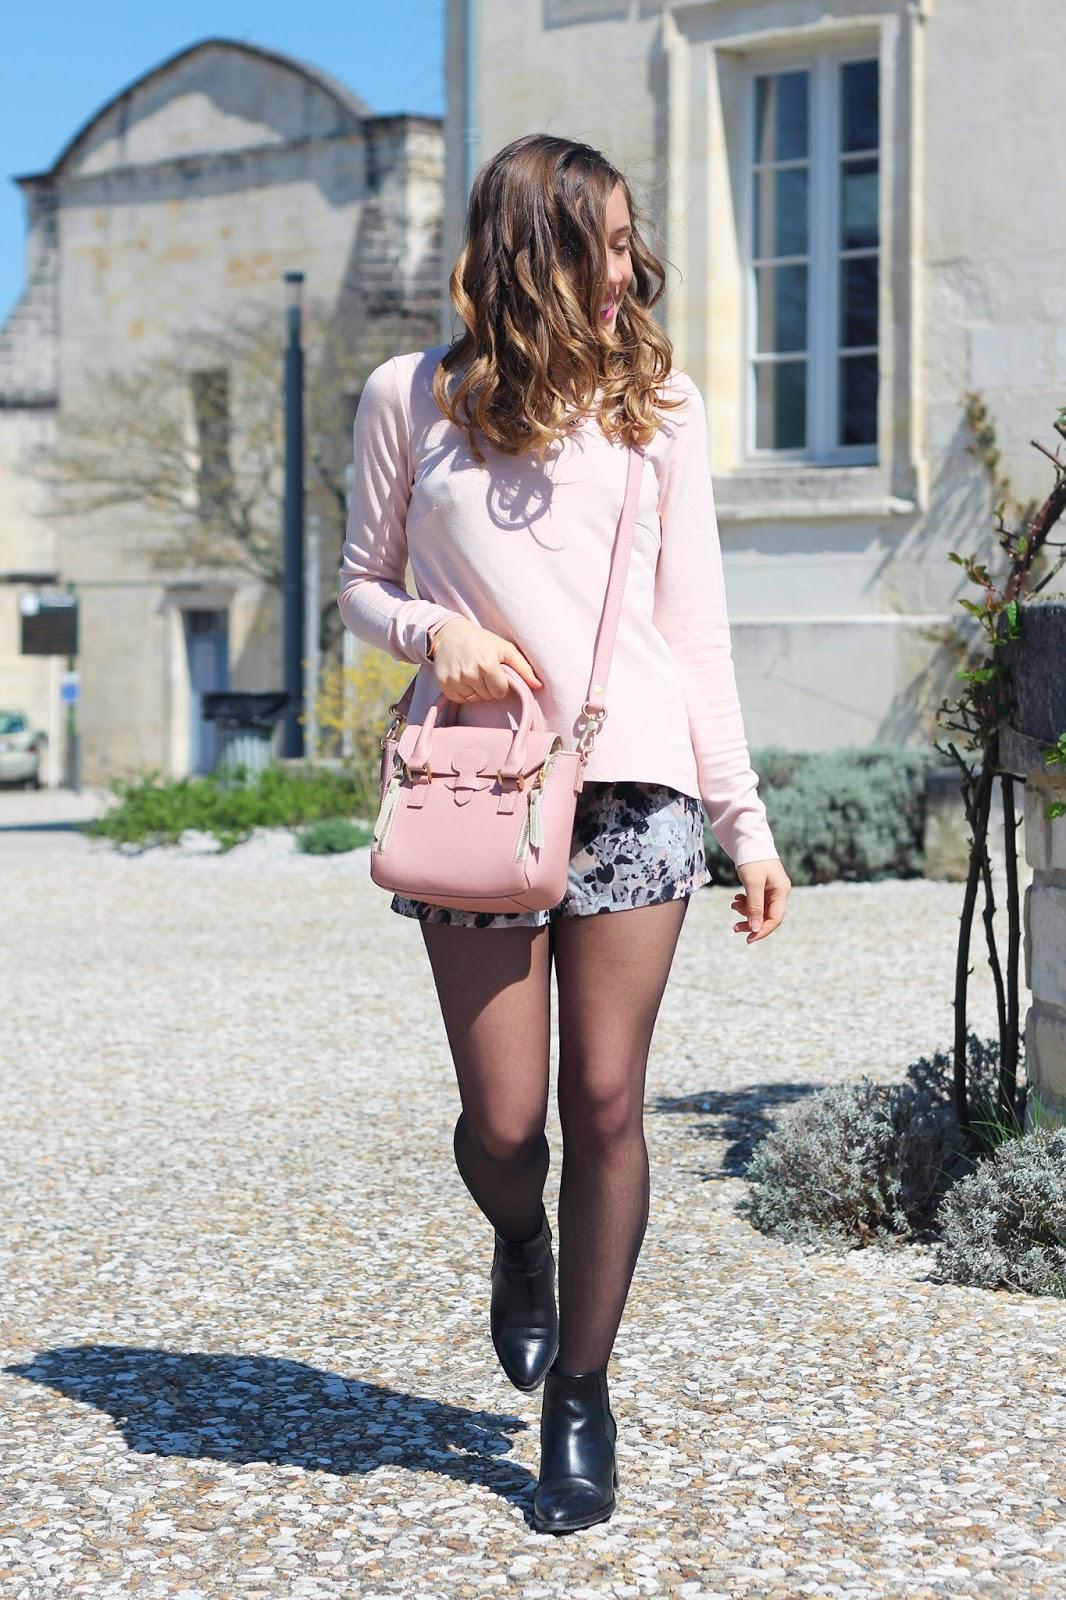 Tenue mode rose pastel printemps